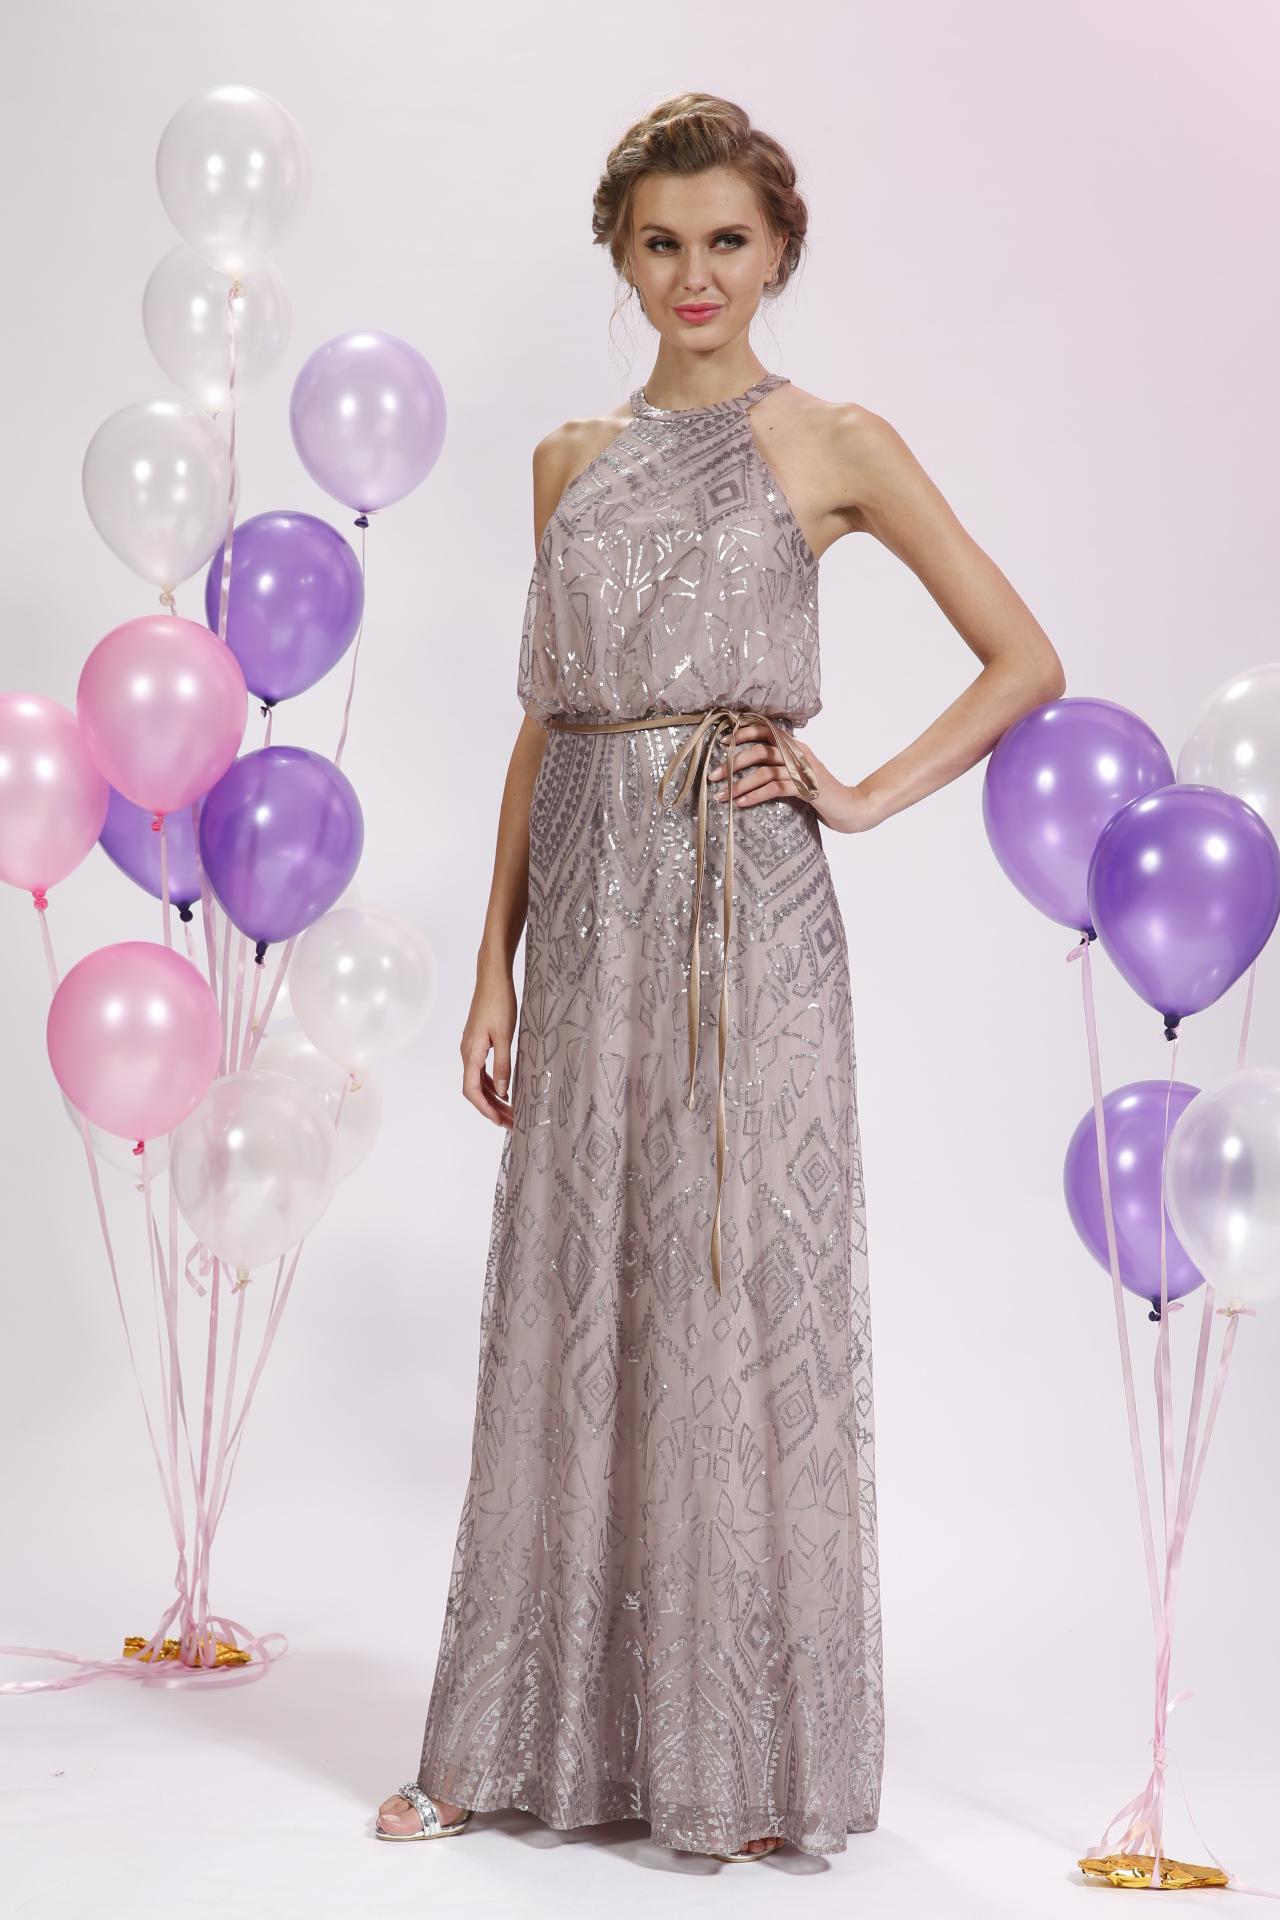 EVENING - Basedow Fashion